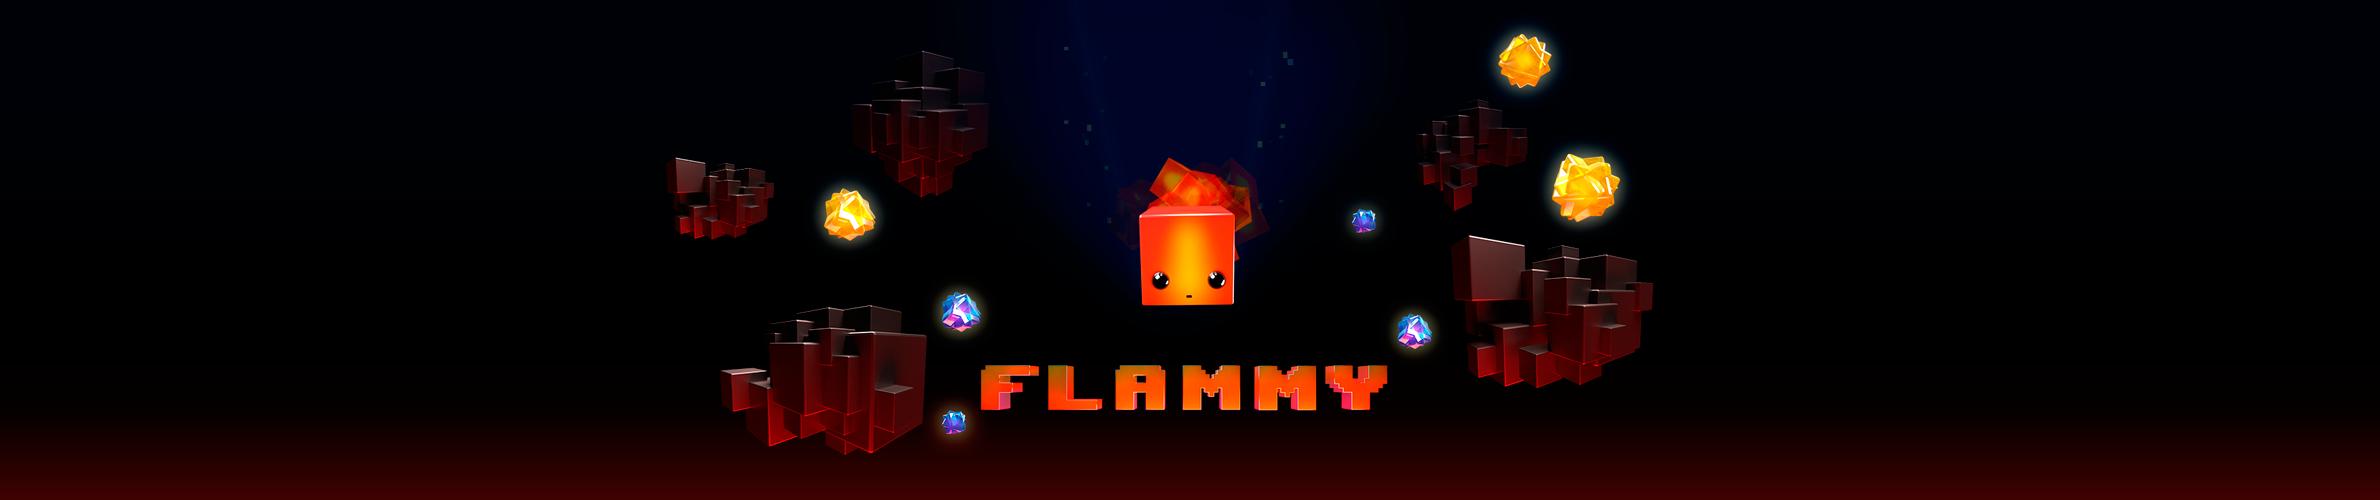 bannerFlammy